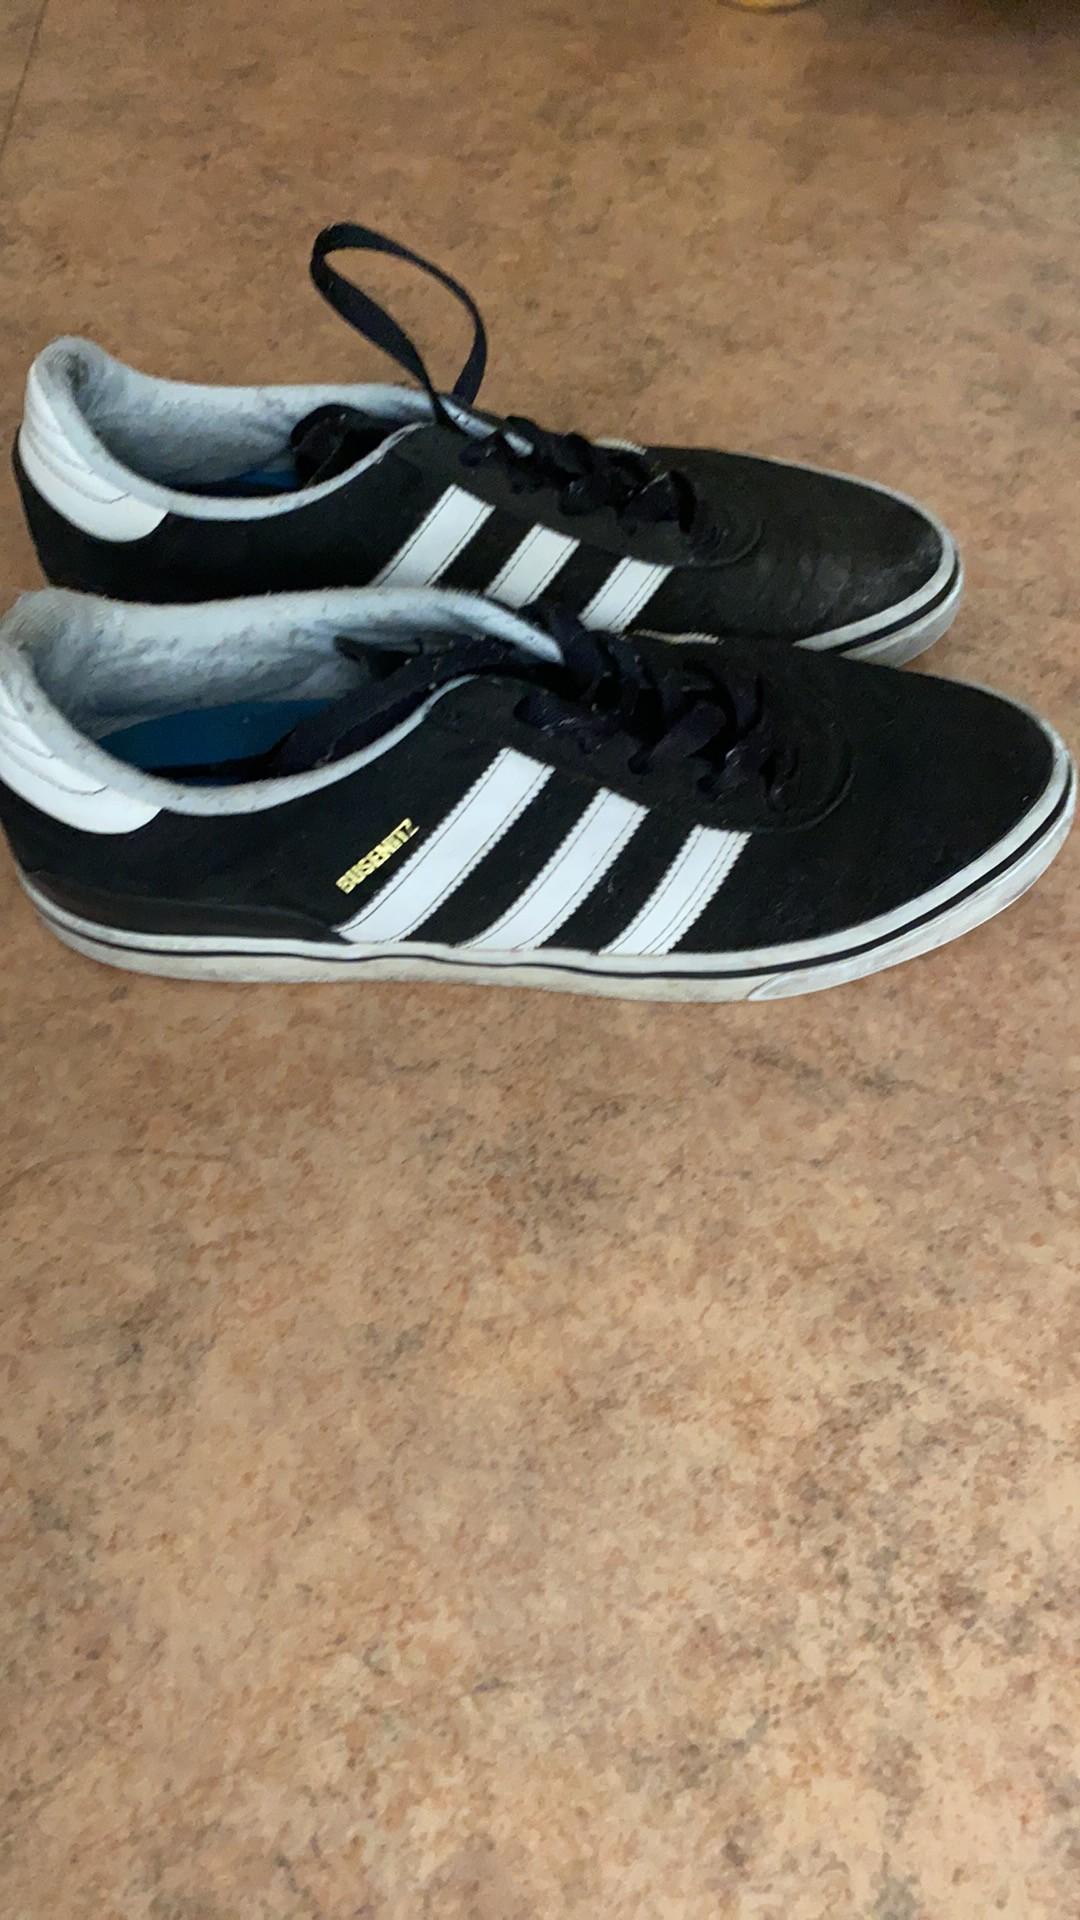 Chaussures Adidas 45